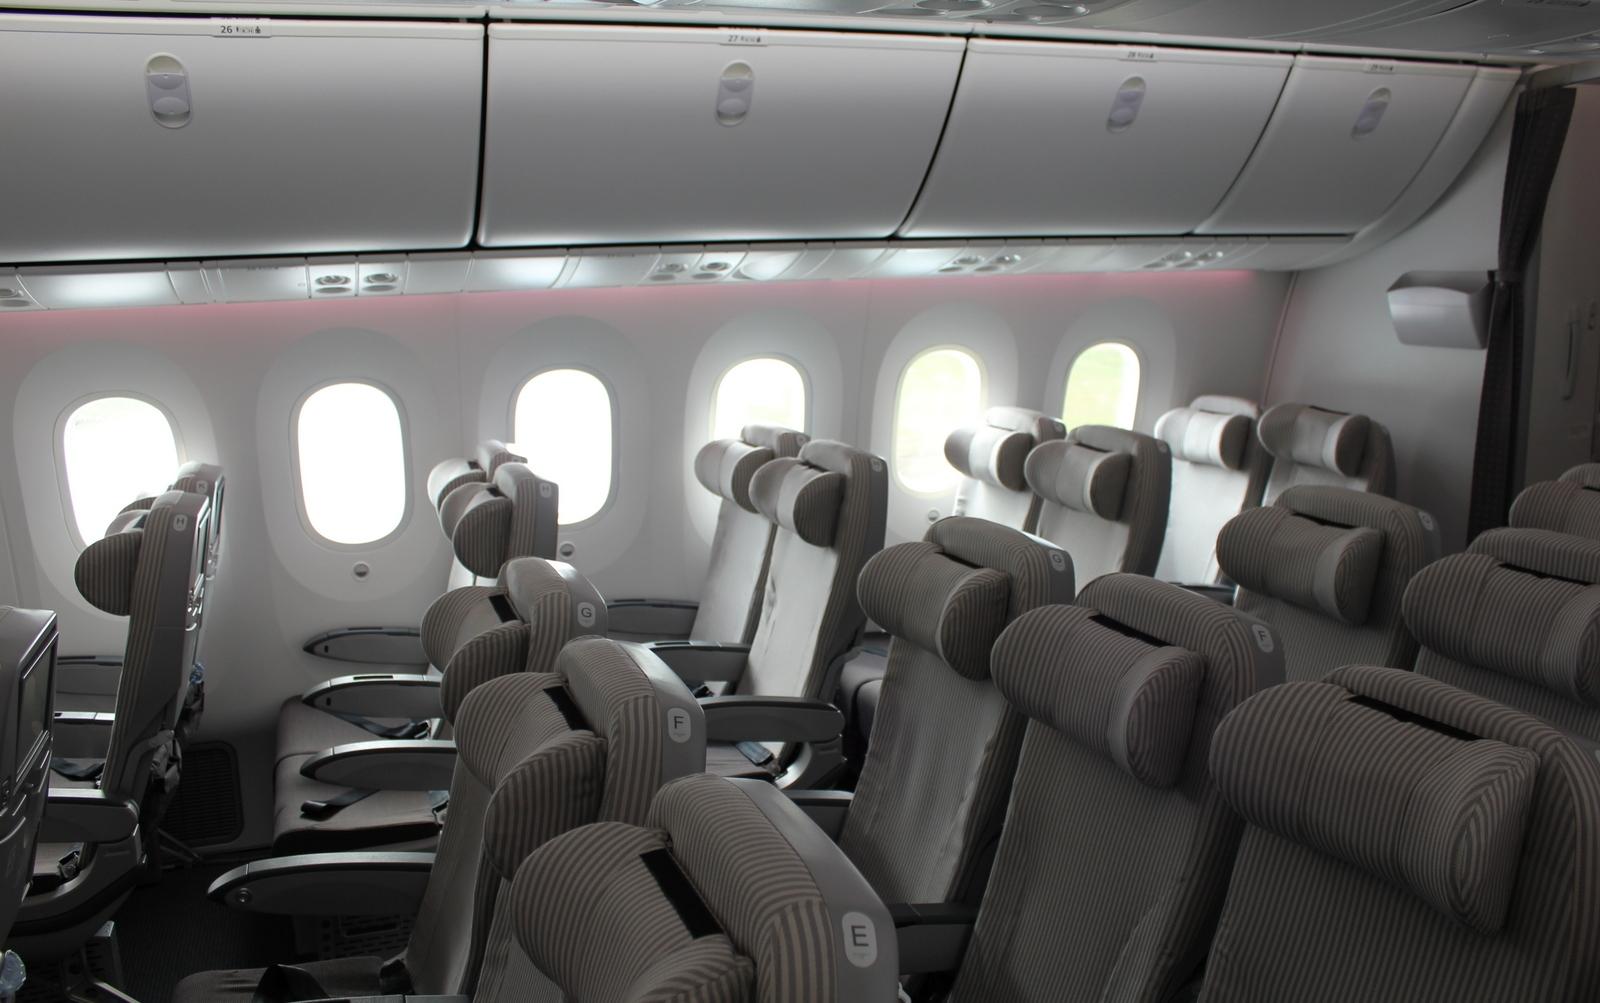 Economy Class Cabin Interior Of Boeing 787 Dreamliner